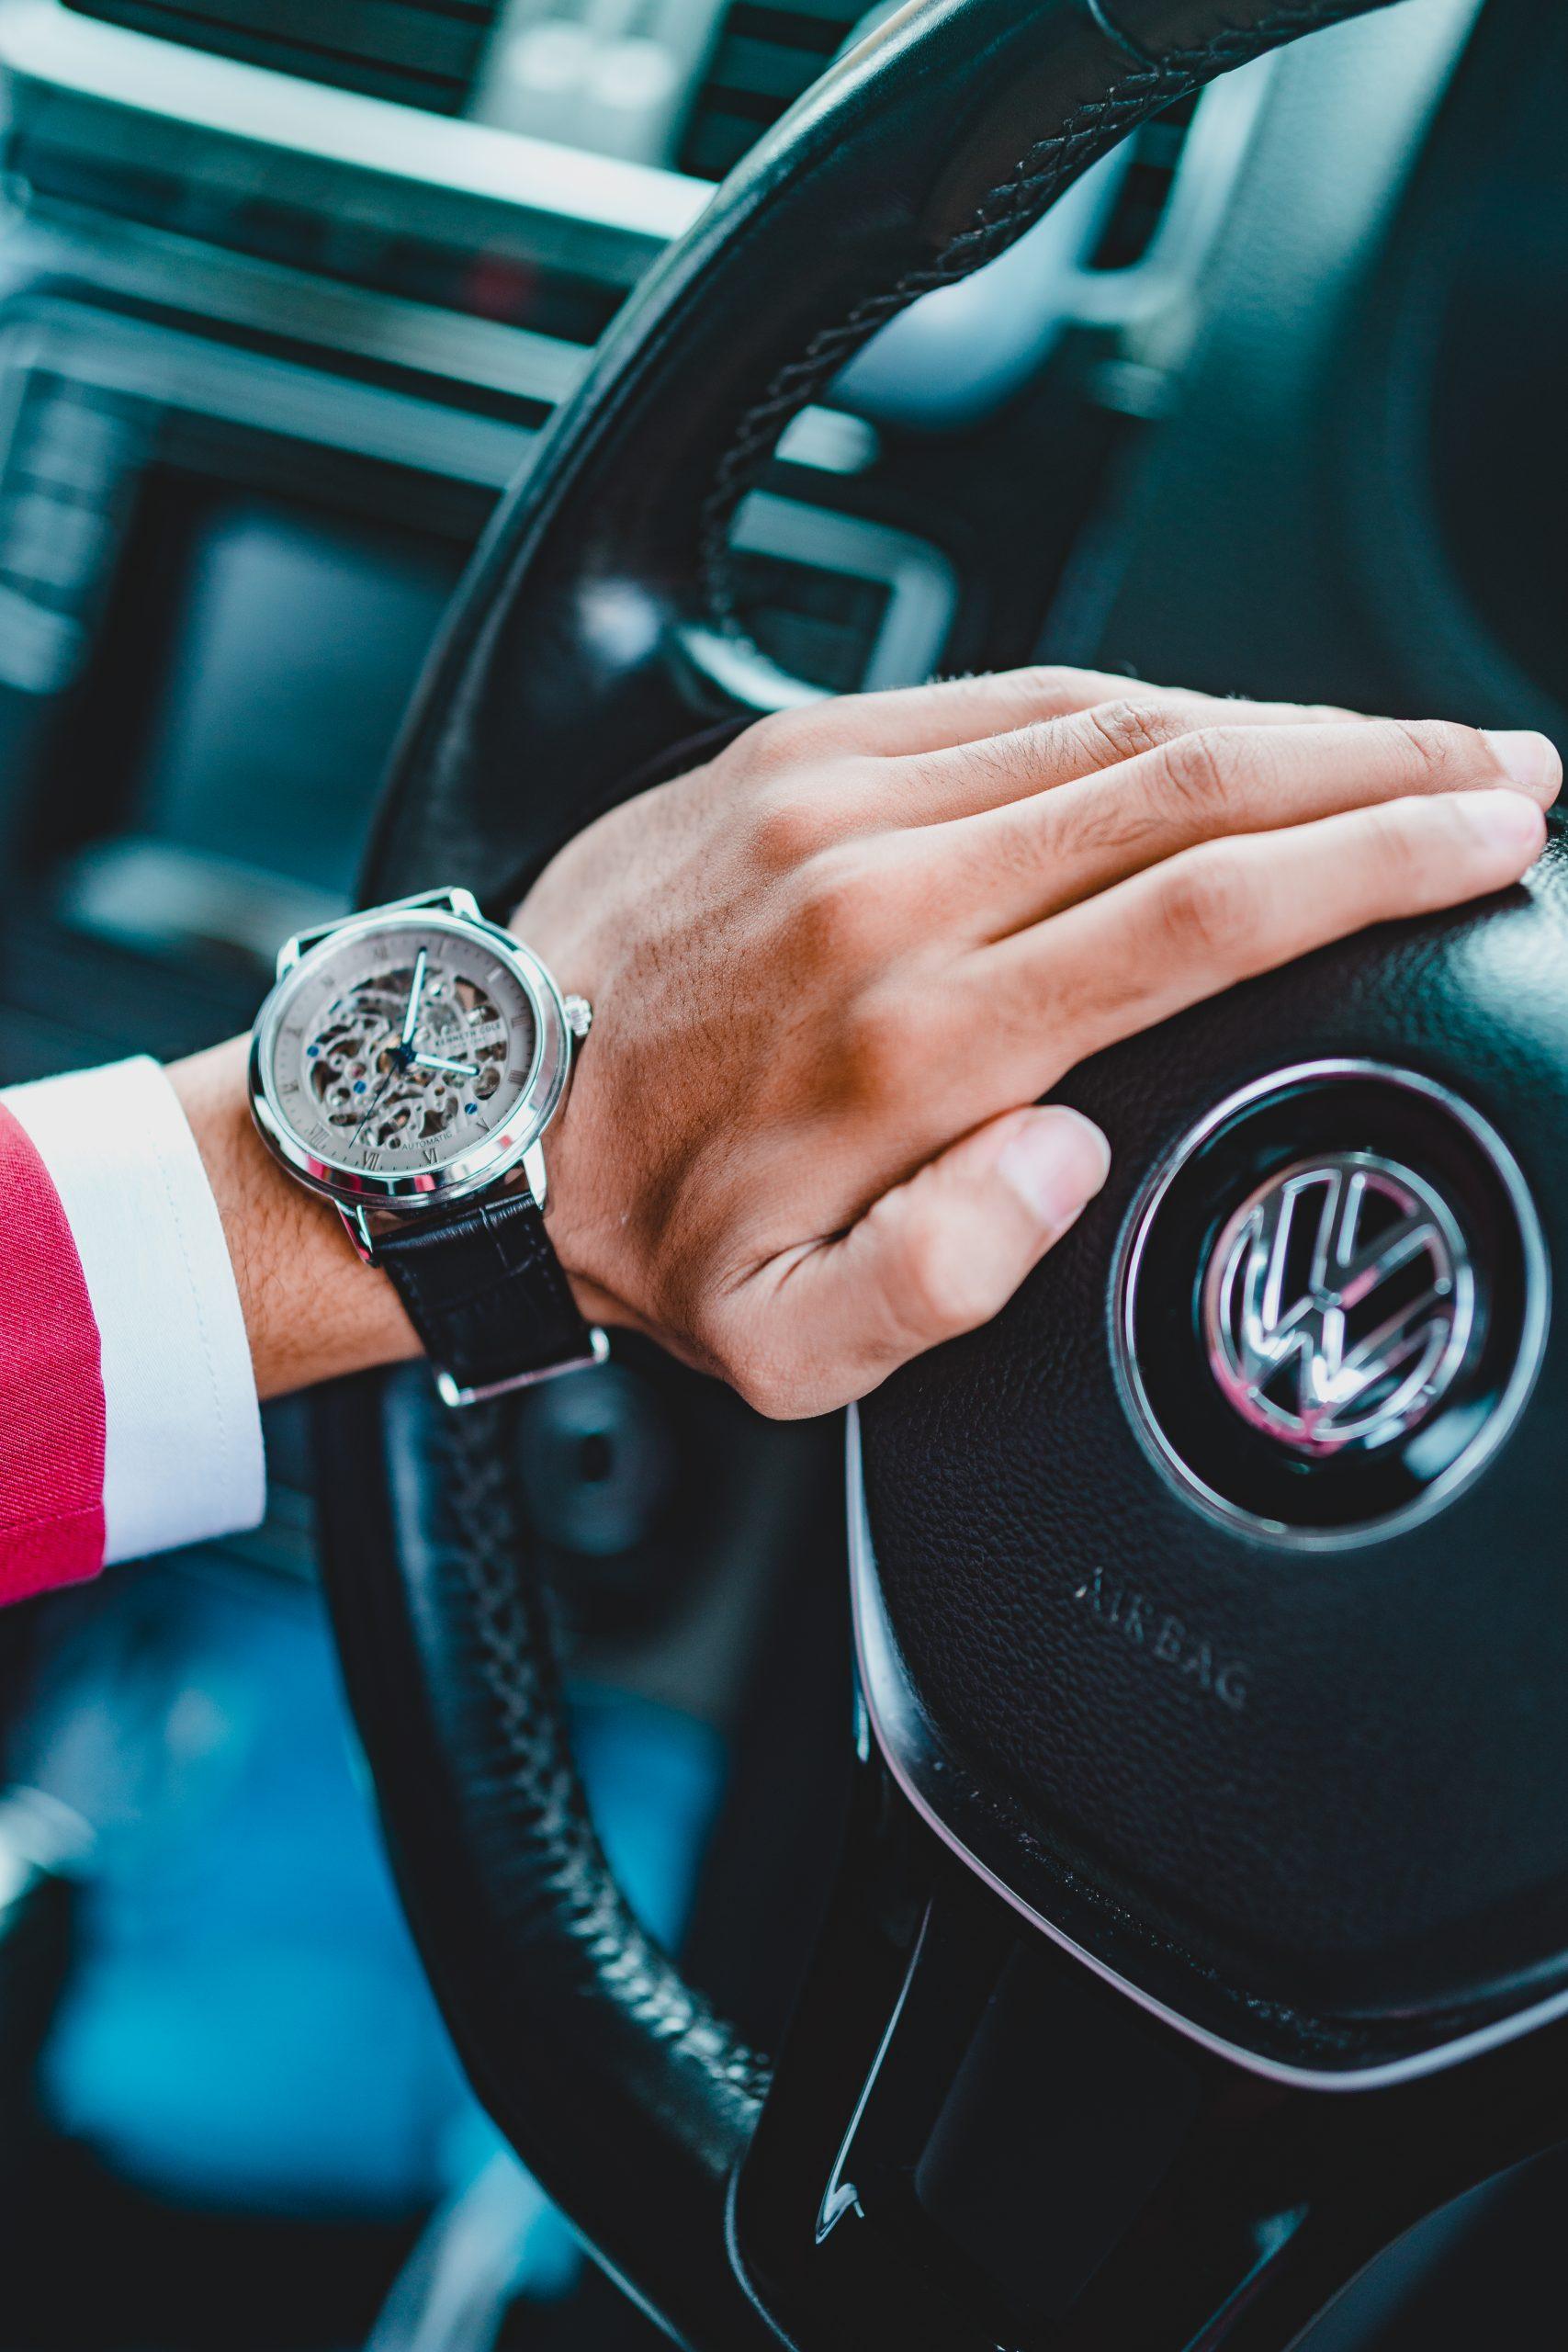 Wrist watch and steering wheel